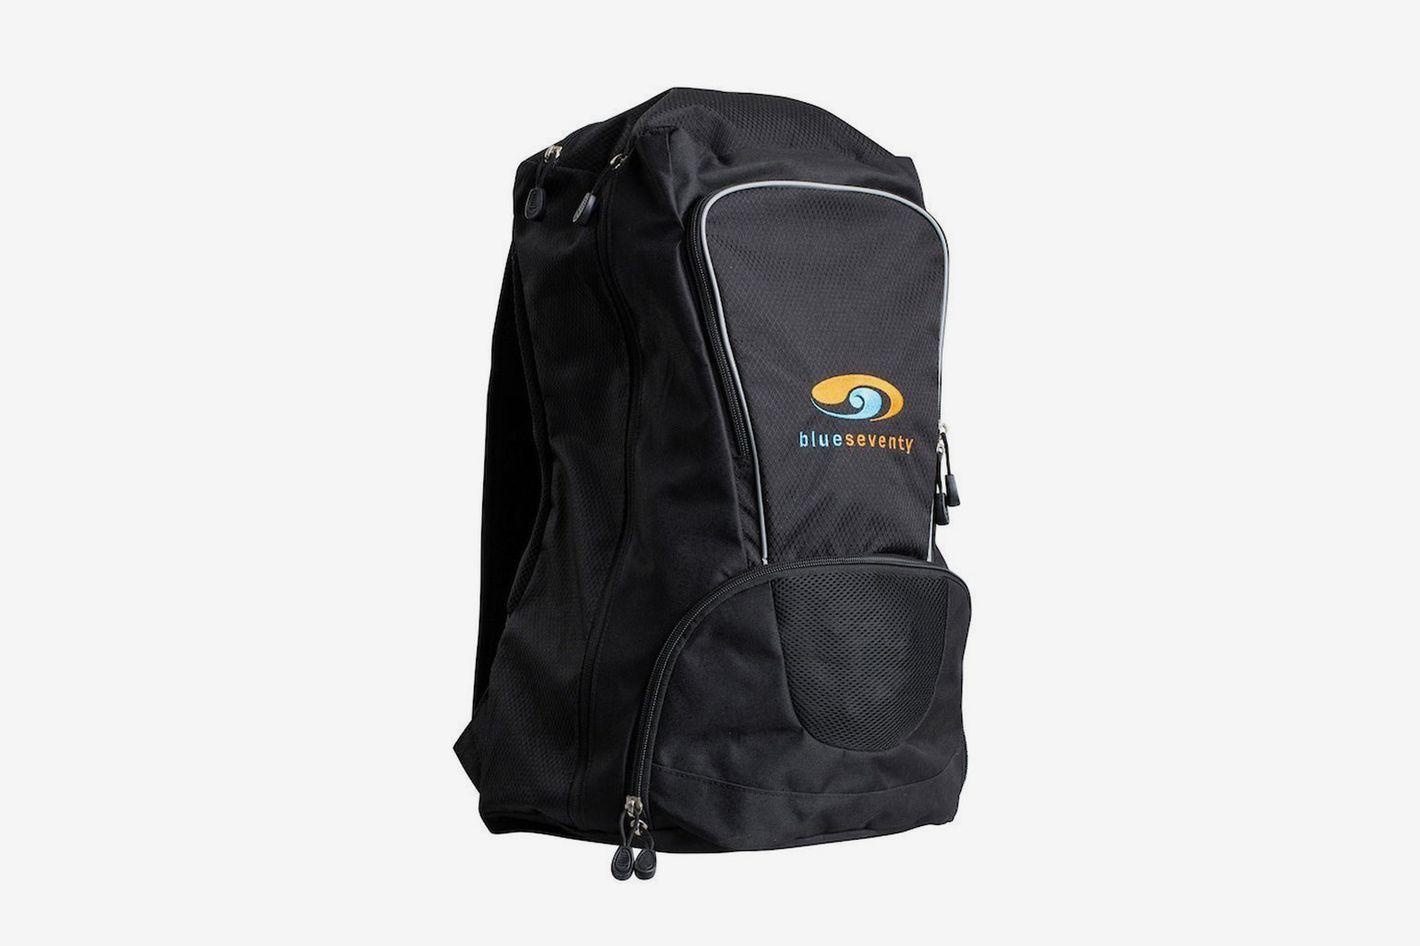 BlueSeventy Streamline Swim Bag